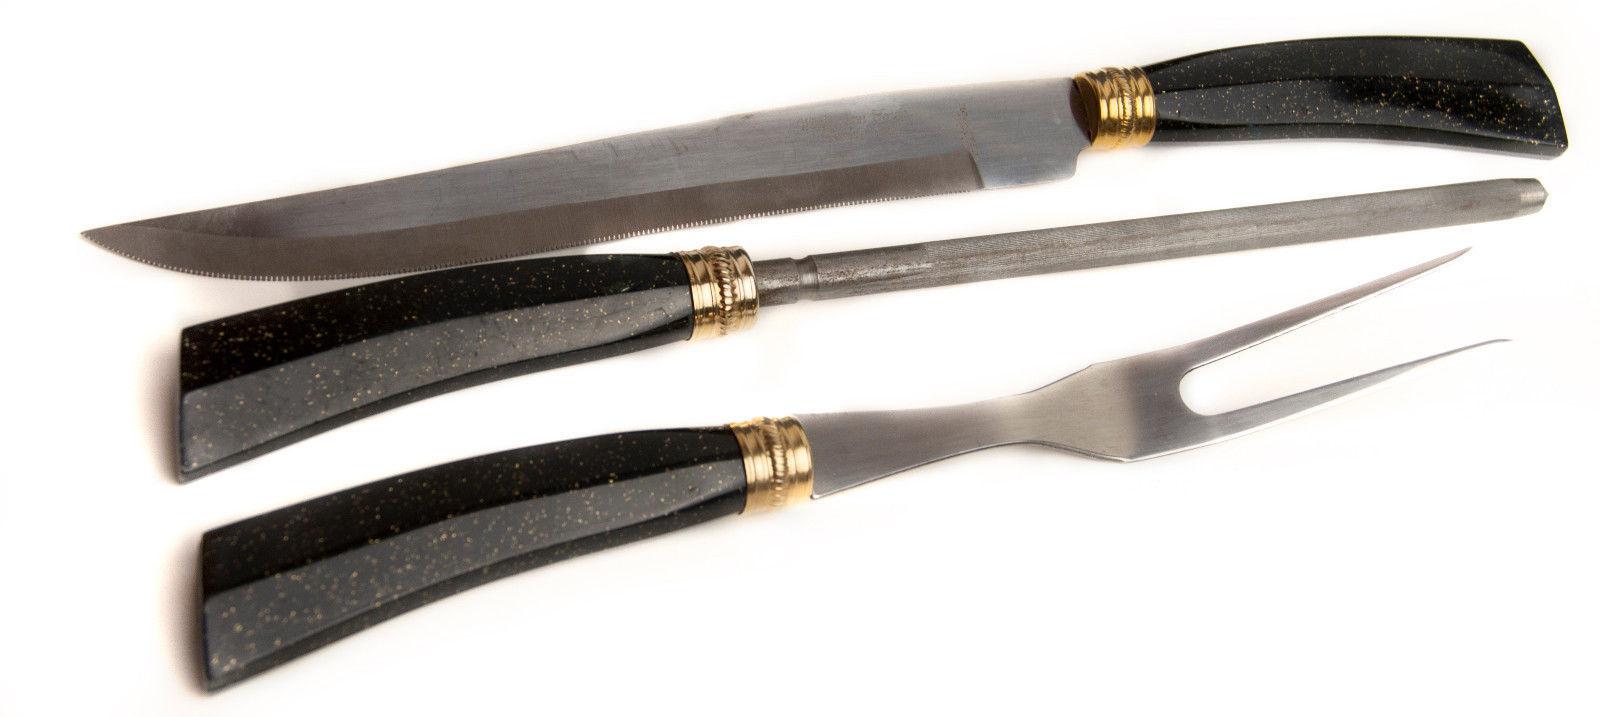 Vintage Washington Forge Sheffield Stainless Steel Black Handle Carving Set - $14.50